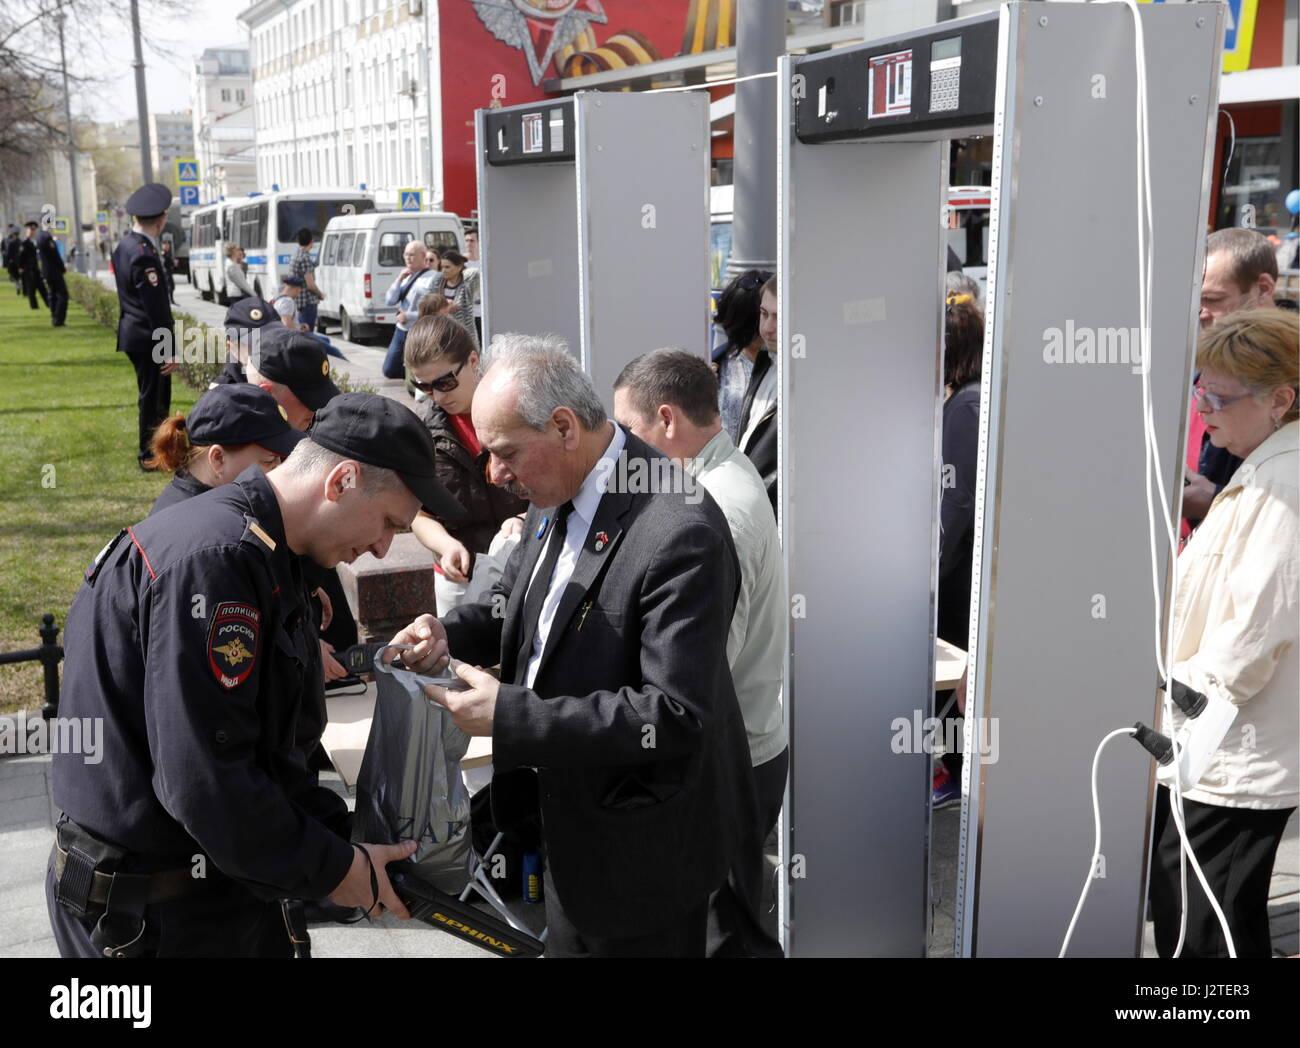 Man With Bag Police Stock Photos & Man With Bag Police Stock